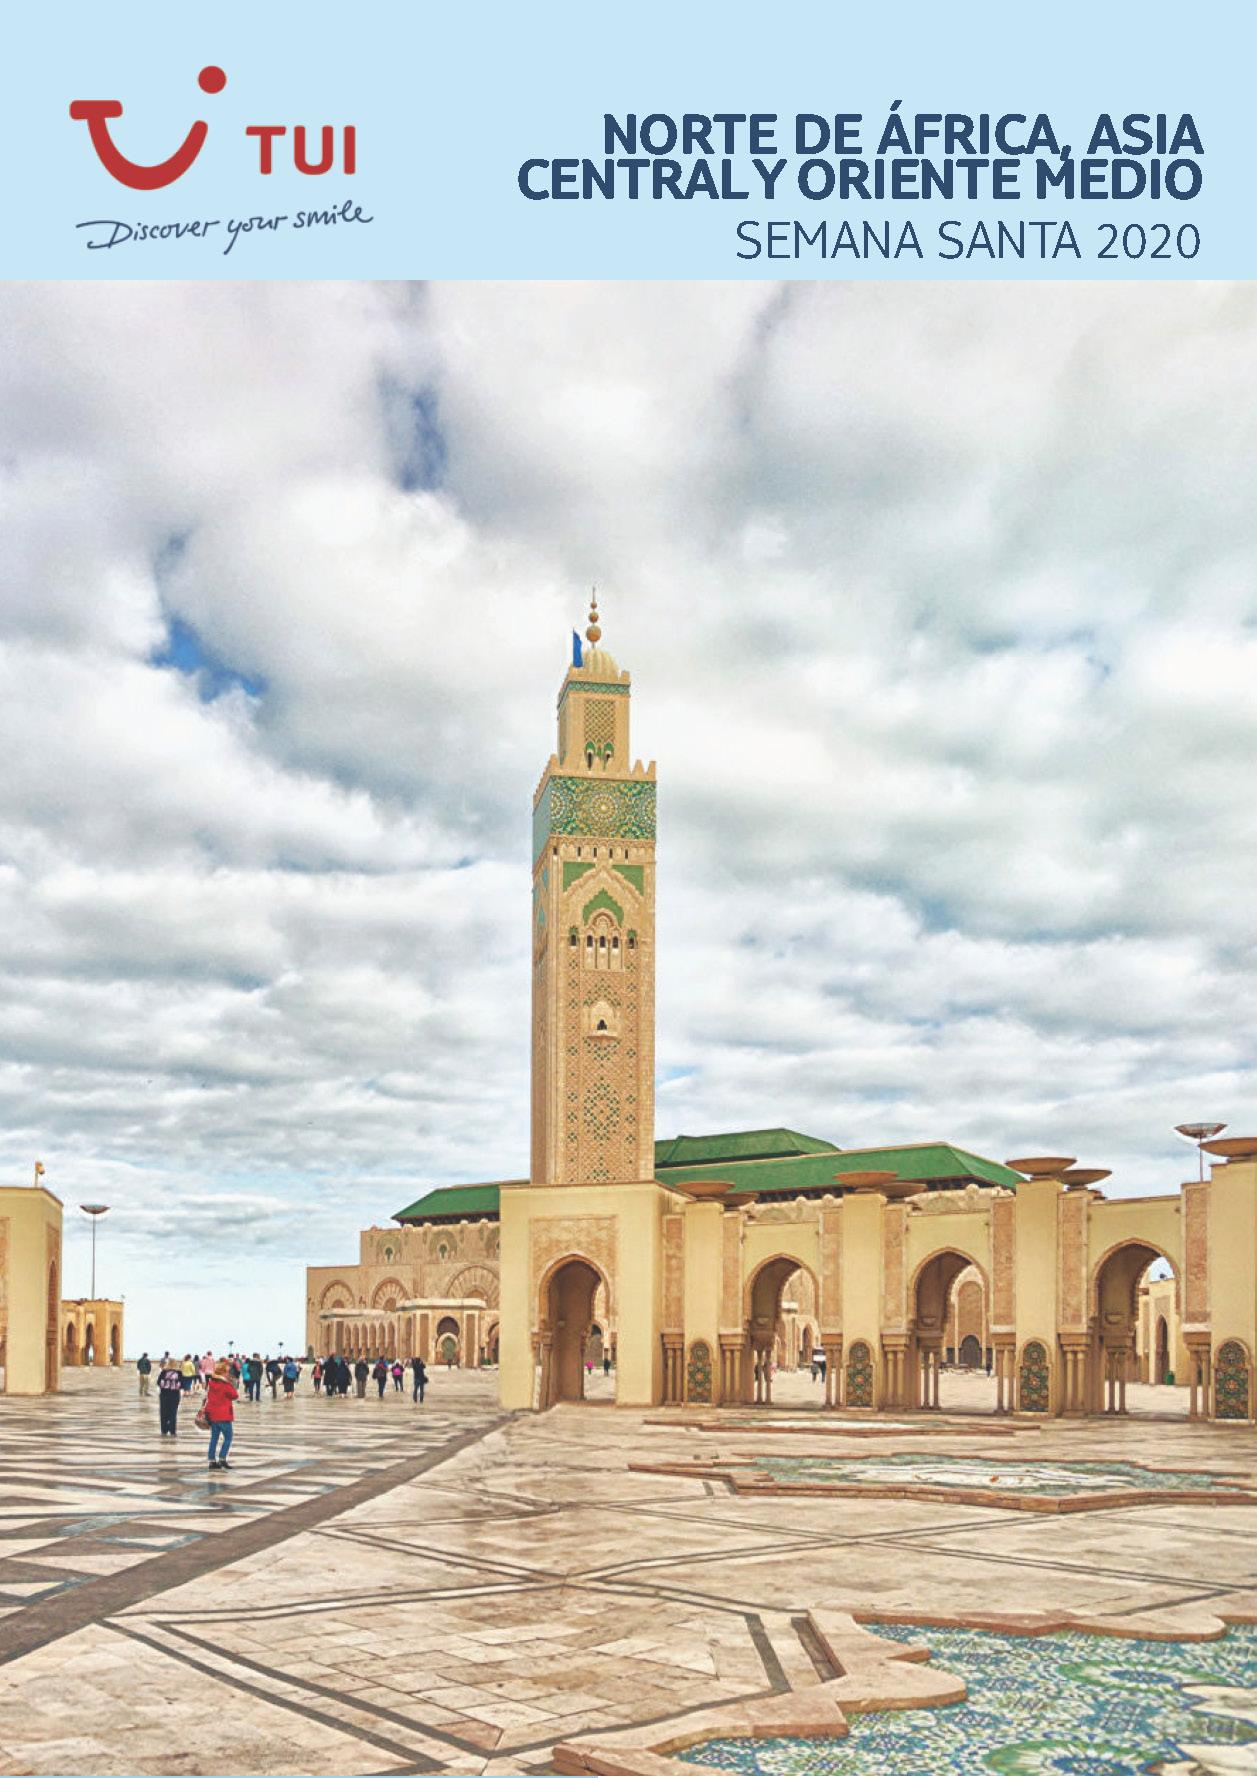 Catalogo TUI Ambassador Tours Semana 2020 Santa Oriente Medio Norte Africa y Asia Central